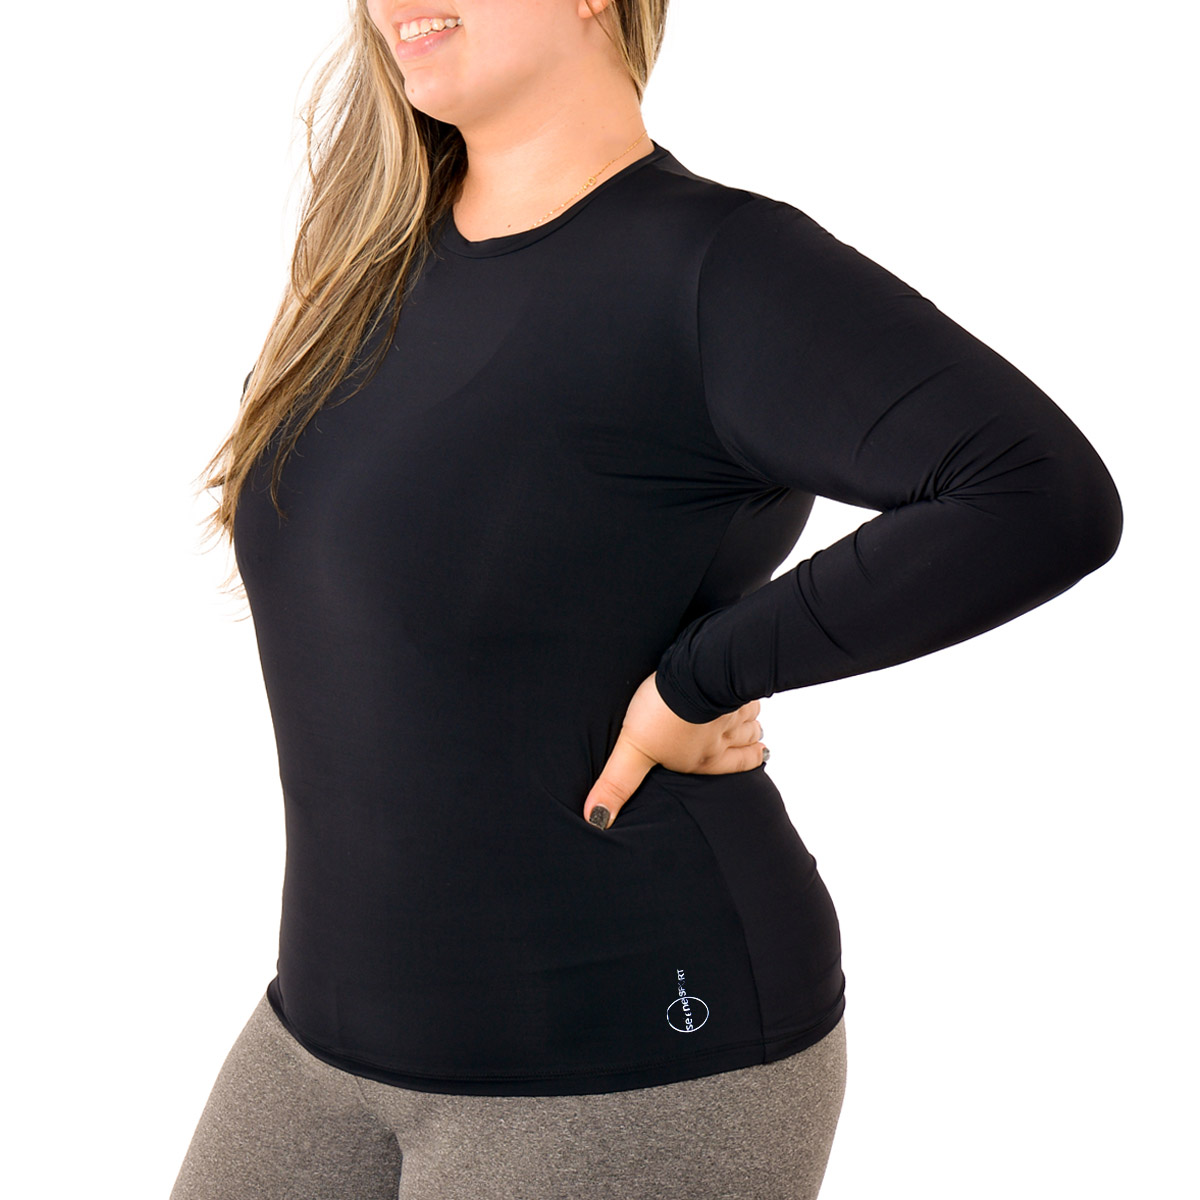 Camiseta plus size manga longa feminina com proteção UV Selene